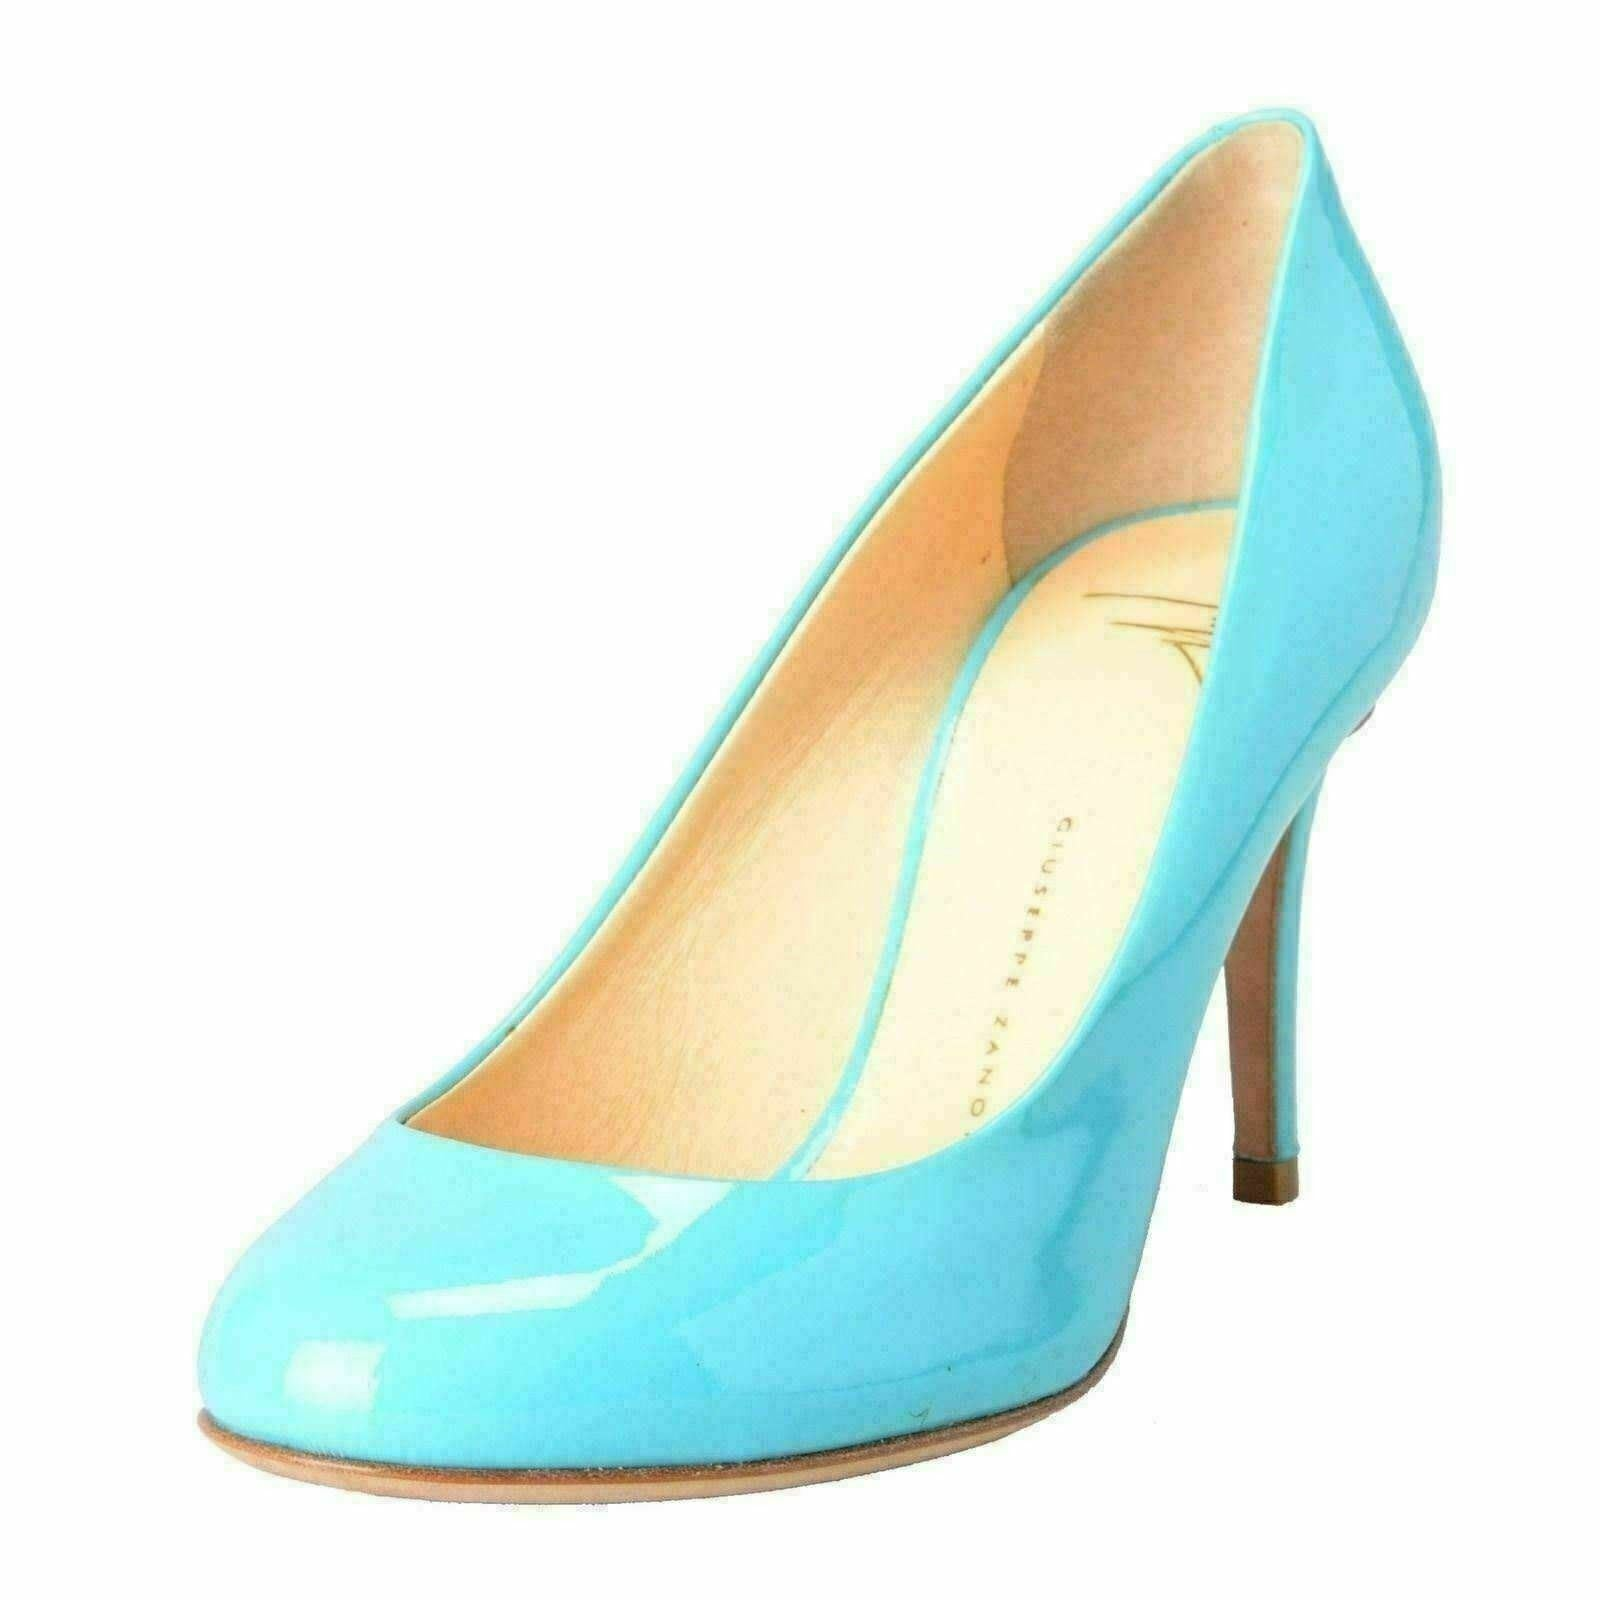 Giuseppe Zanotti Design Damen Aqua Blau Pumps High Heels Schuhe US 5 It 36